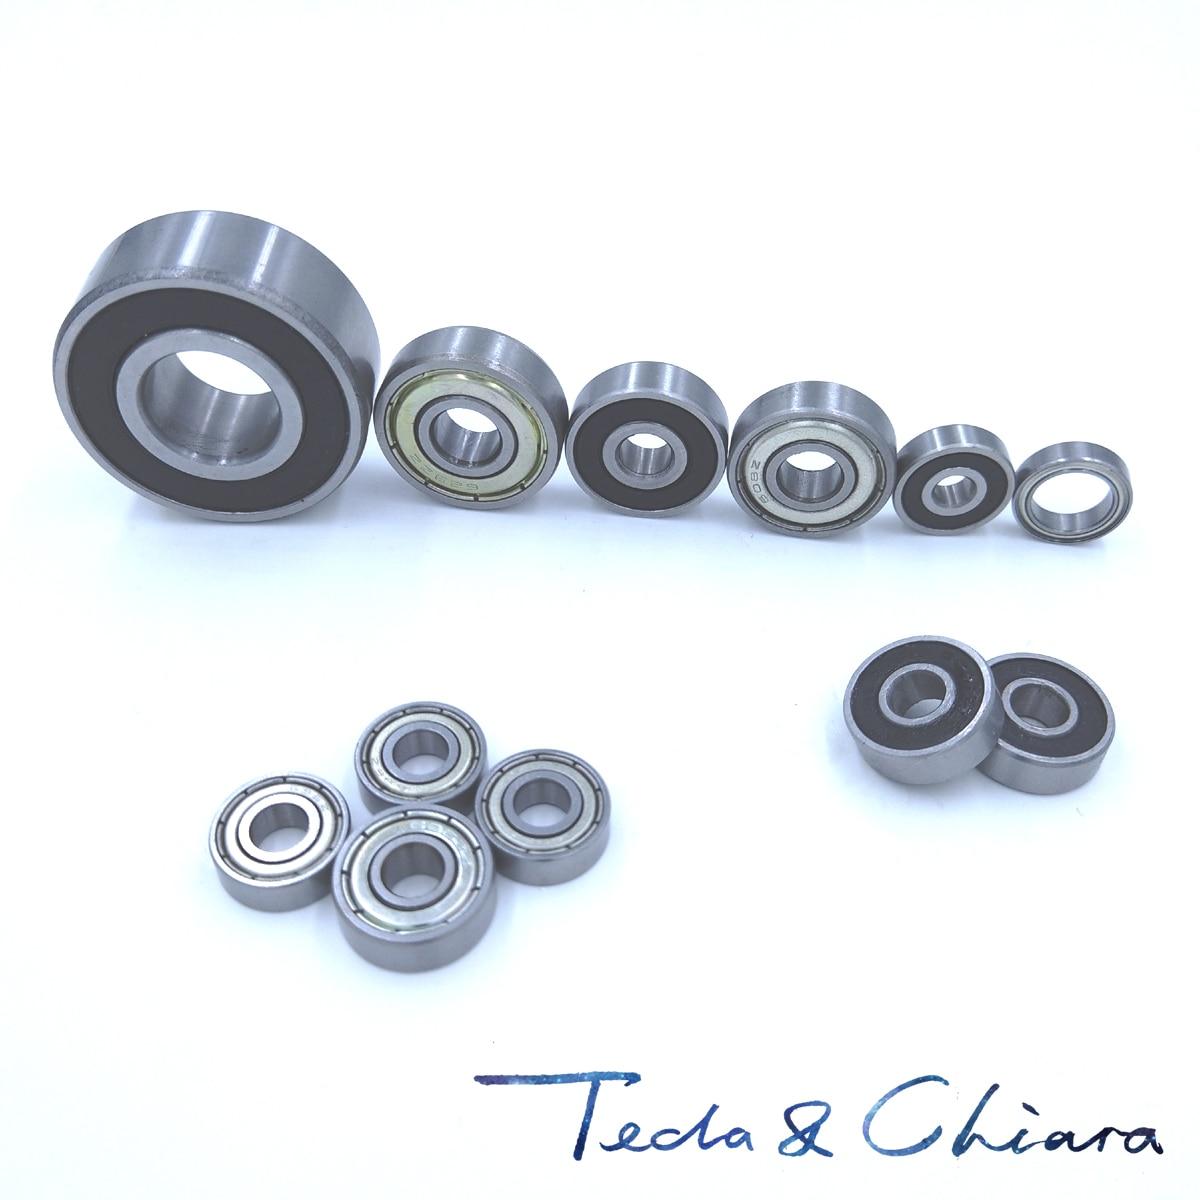 10Pcs 1Lot MR105 MR105ZZ MR105RS MR105-2Z MR105Z MR105-2RS ZZ RS RZ 2RZ Deep Groove Ball Bearings 5 X 10 X 4mm